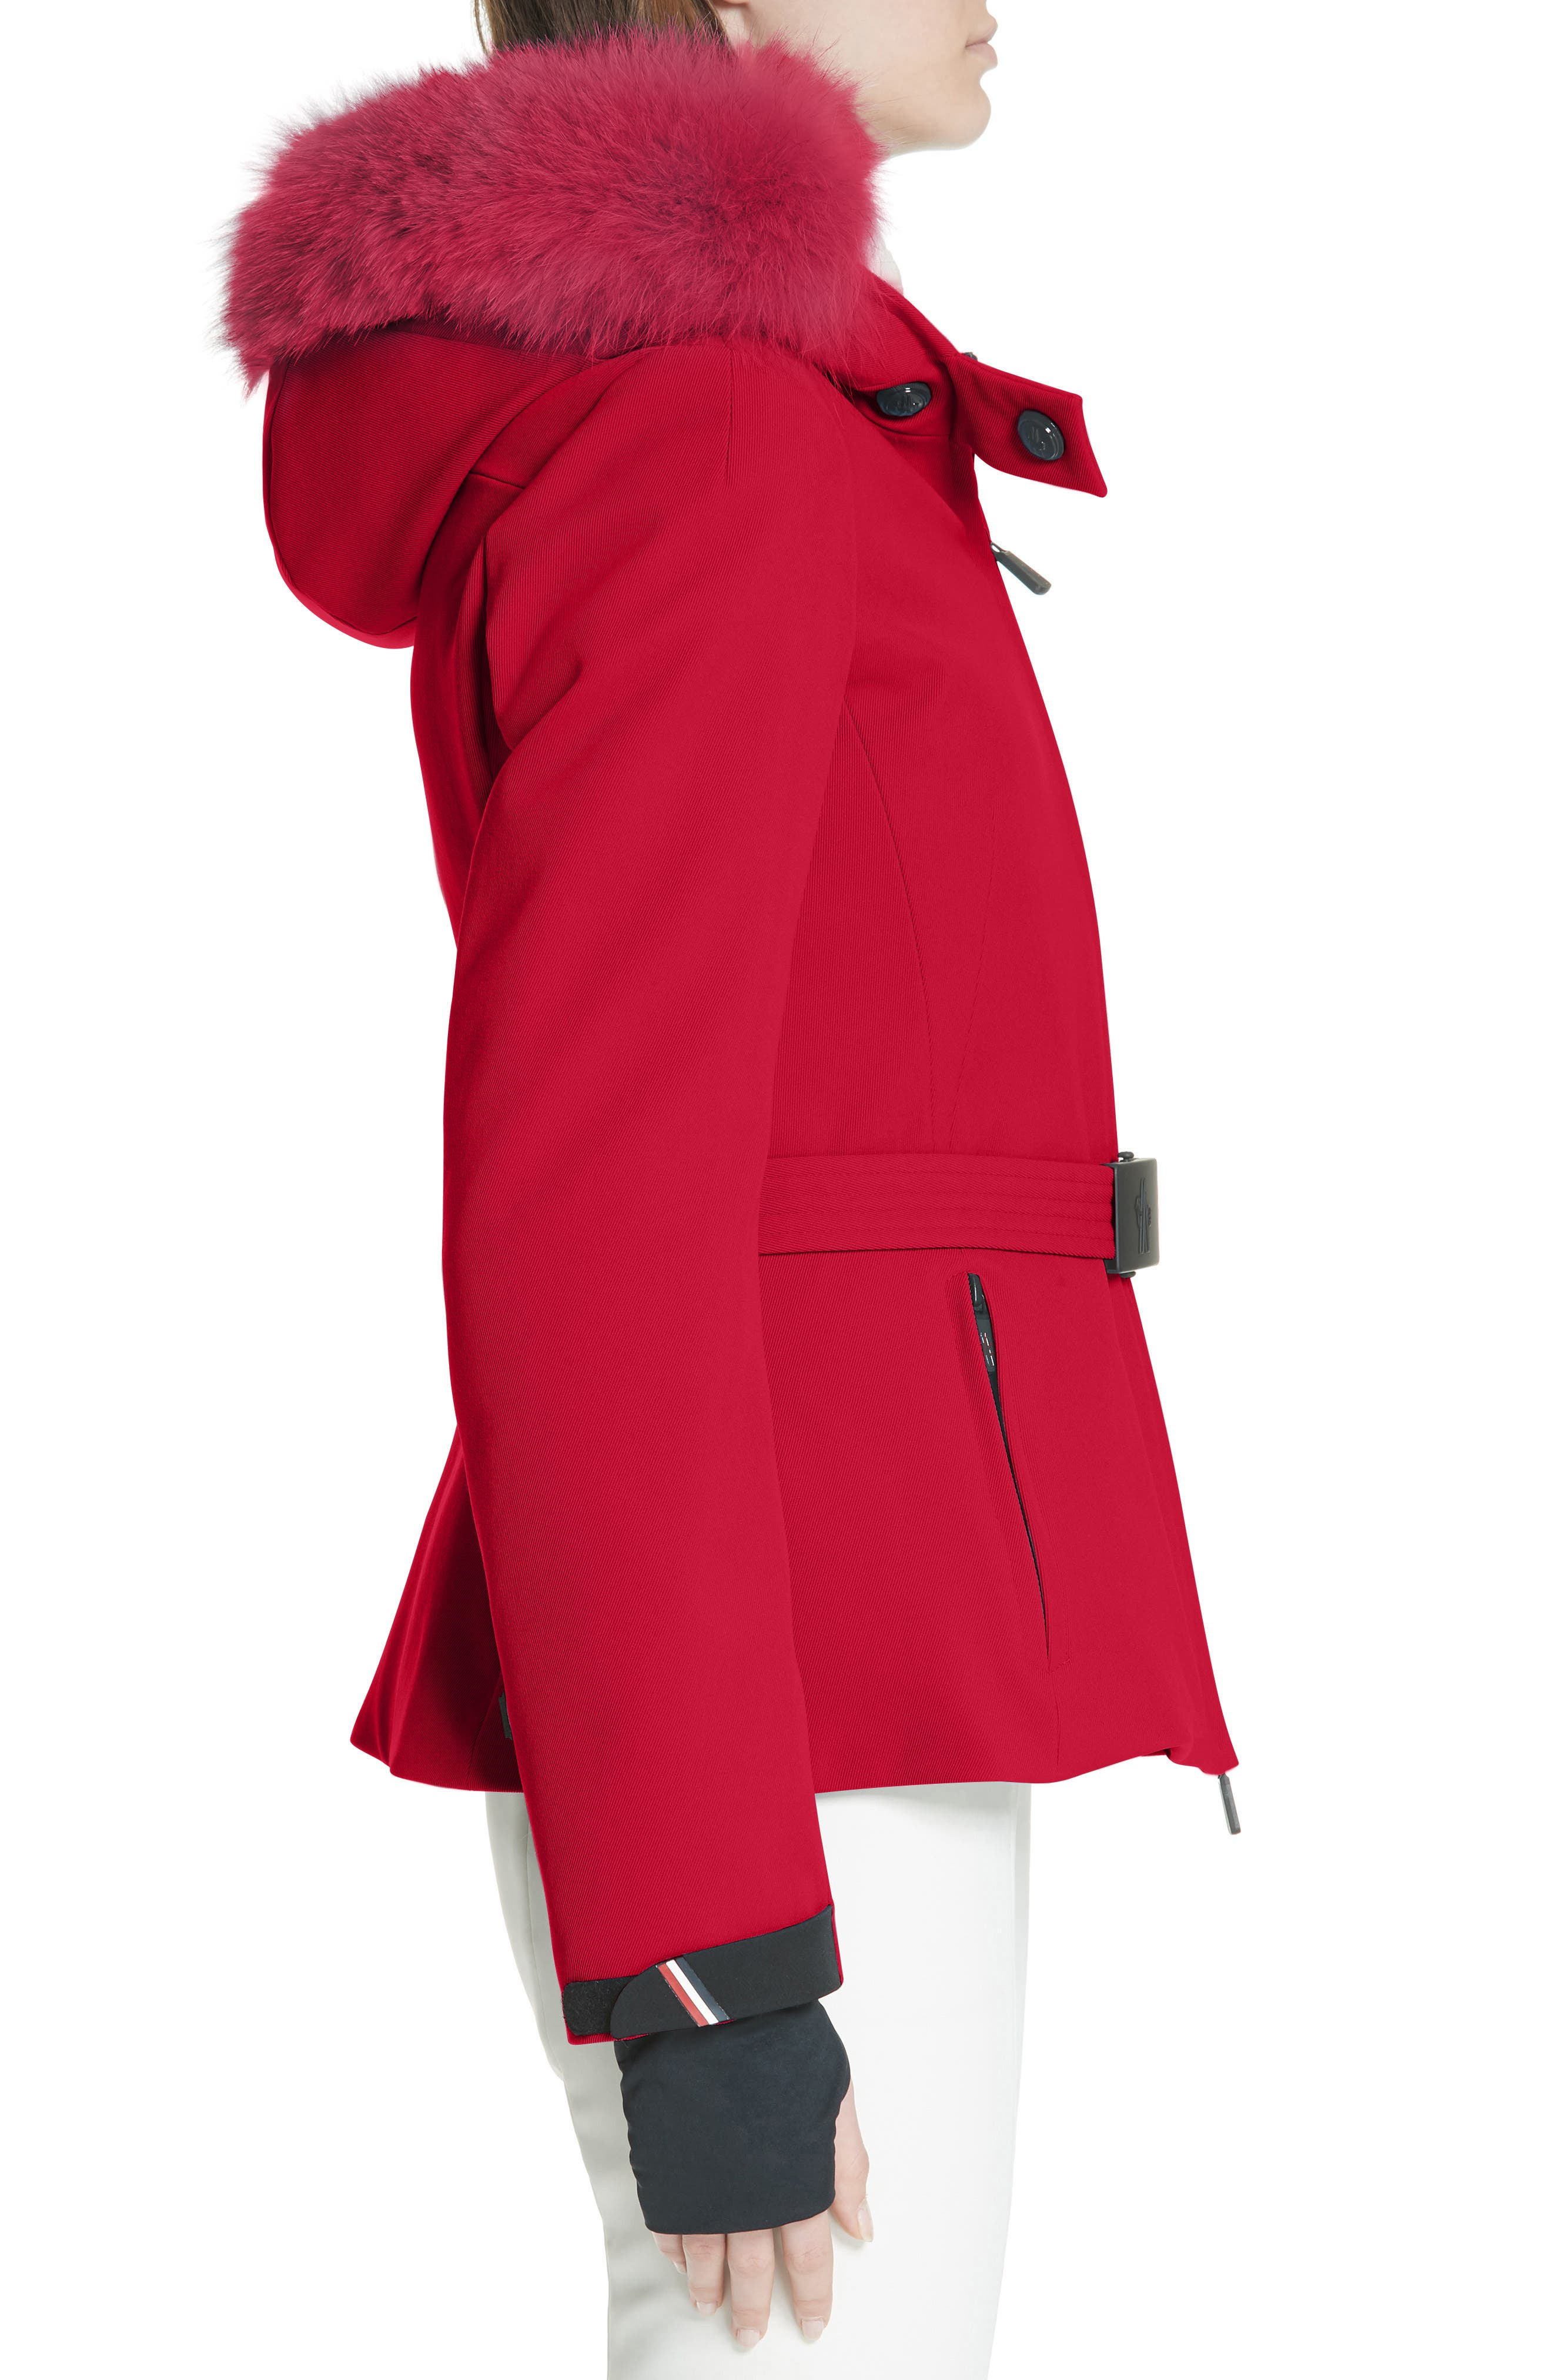 MONCLER,                             Bauges Water Repellent Hooded Down Coat with Detachable Genuine Fox Fur Trim,                             Alternate thumbnail 3, color,                             RED